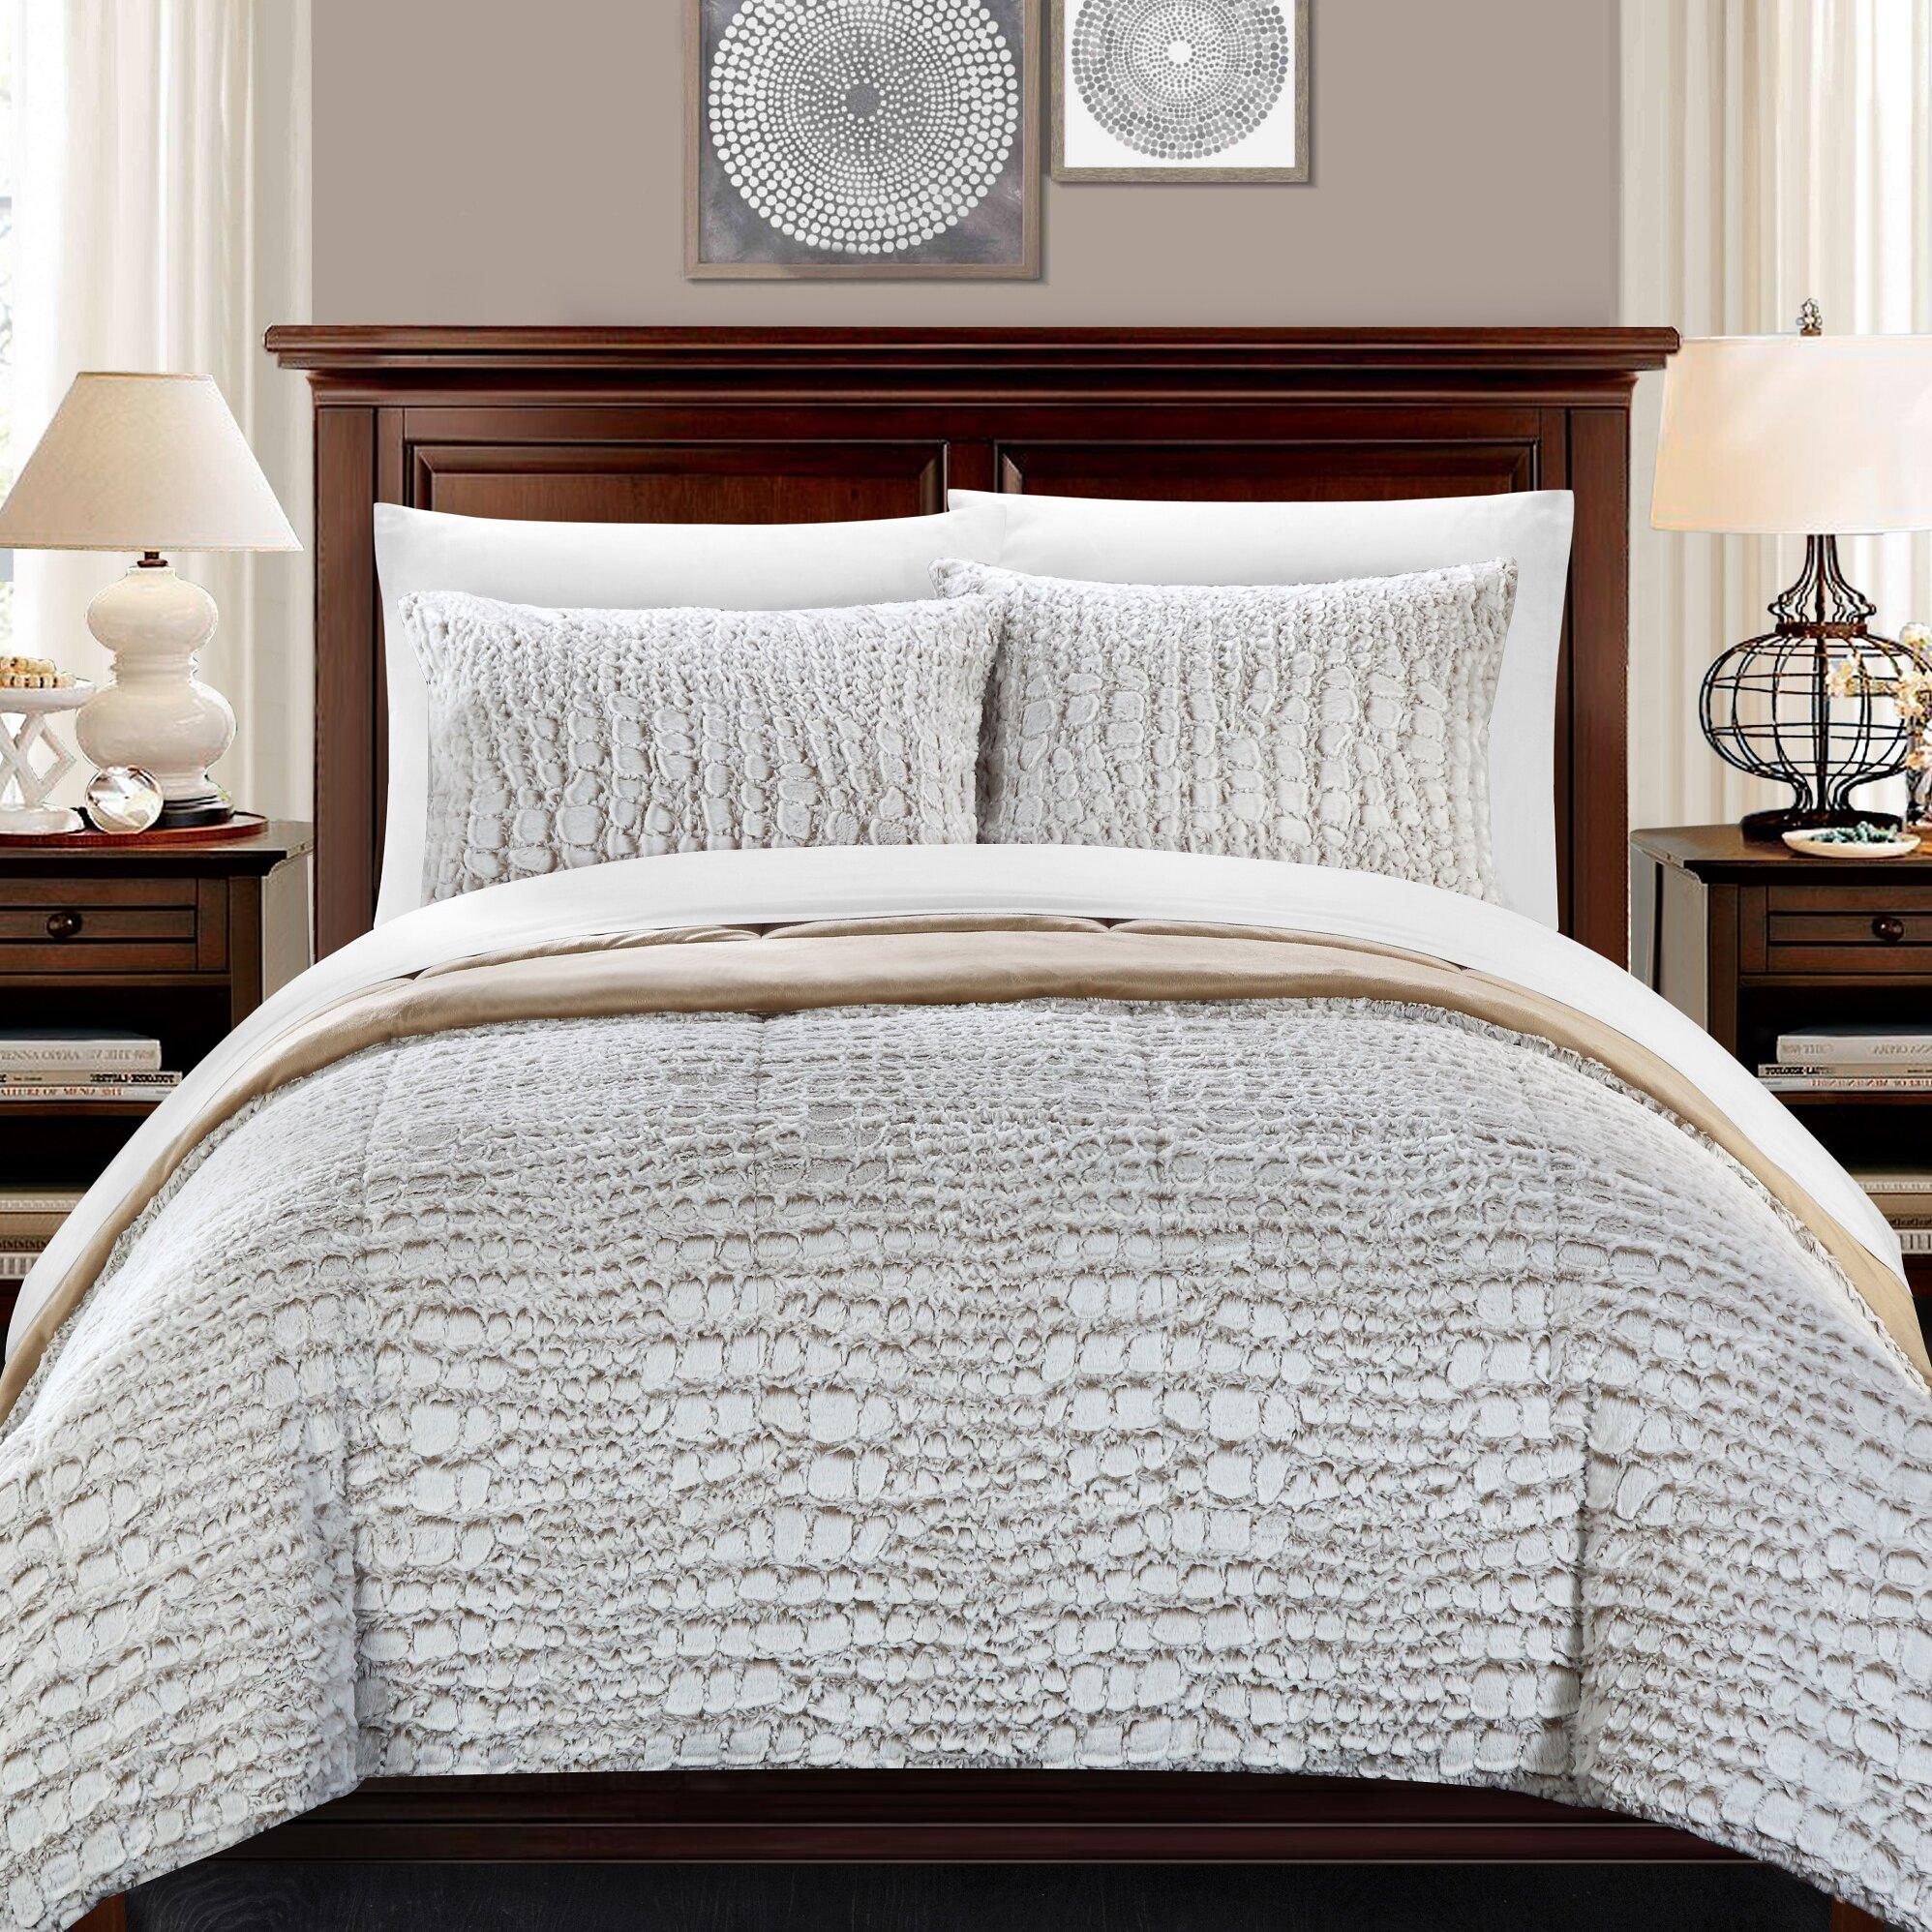 chic home alligator 7 piece queen comforter set reviews wayfair. Black Bedroom Furniture Sets. Home Design Ideas